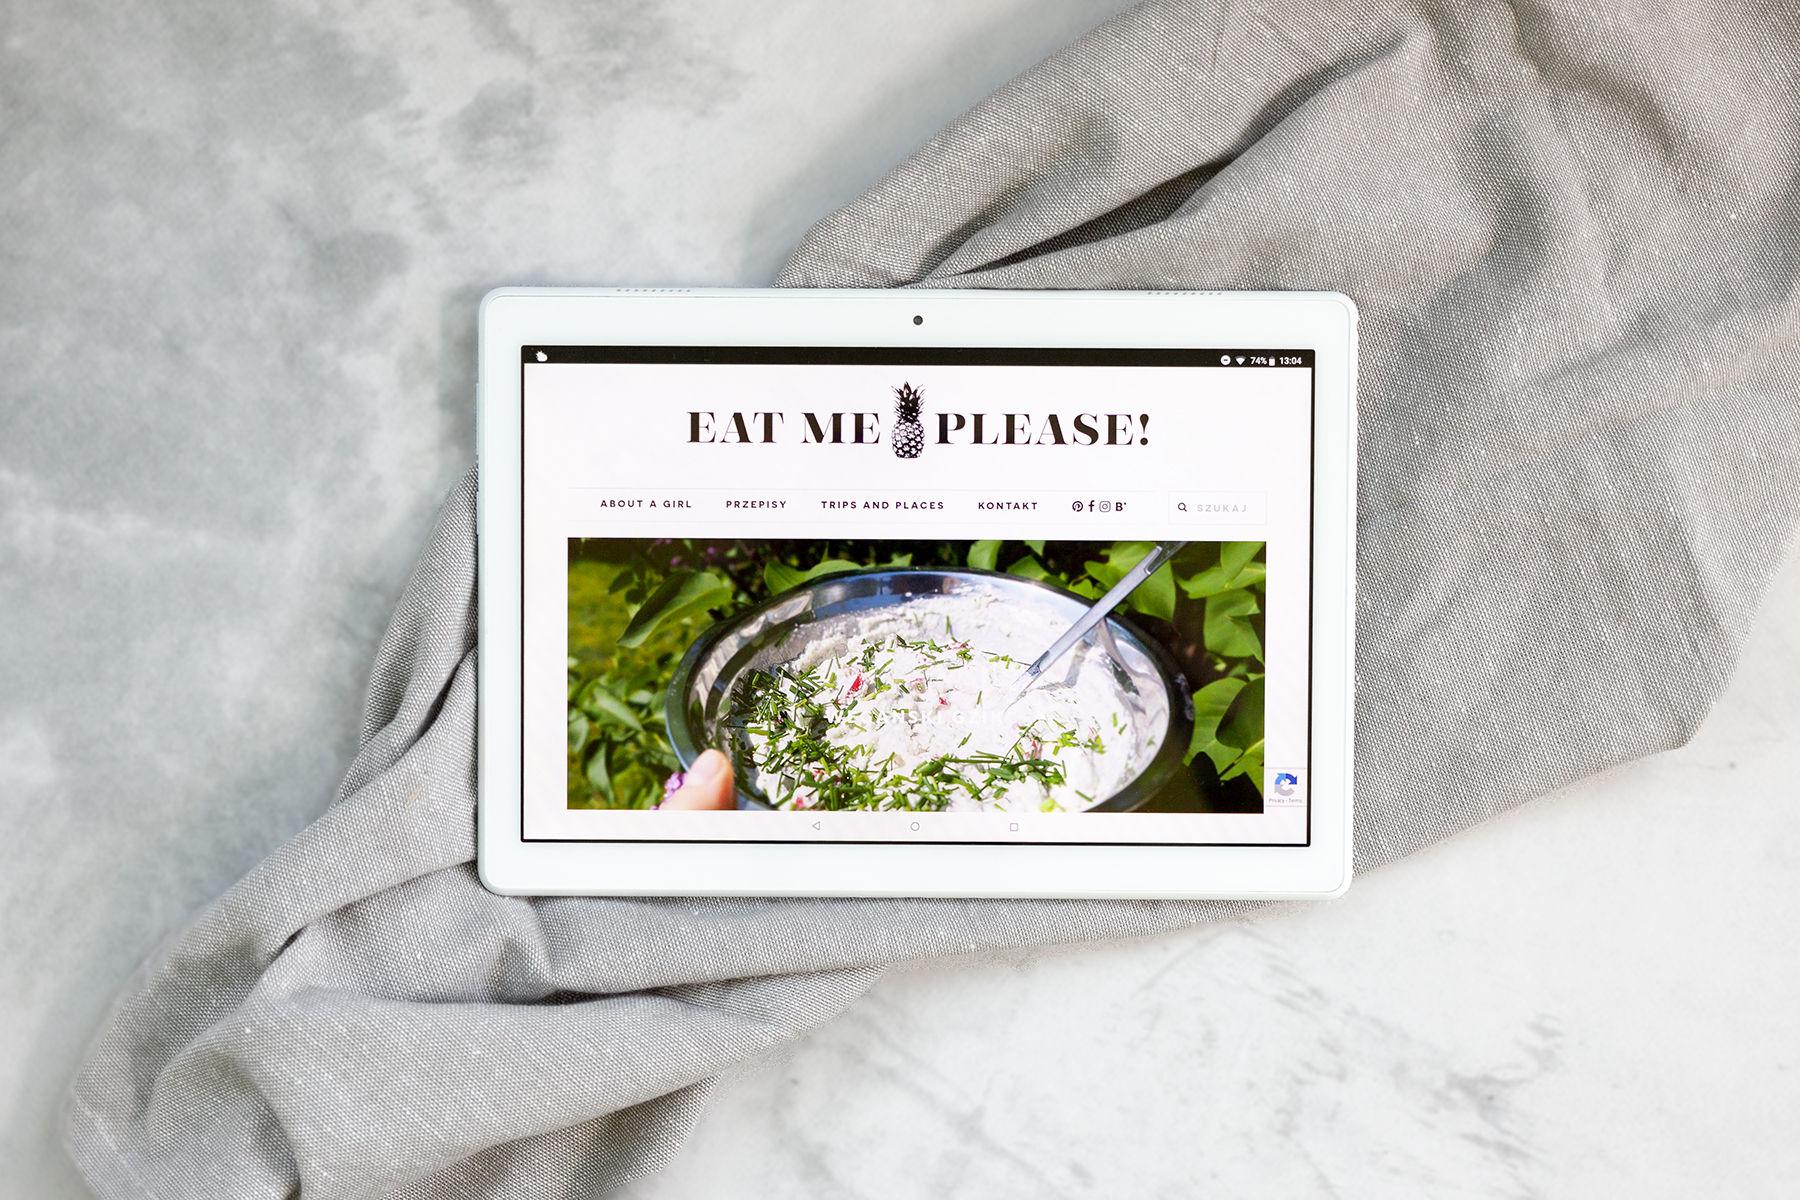 tablet z blogiem eat me please, wegańskie blogi